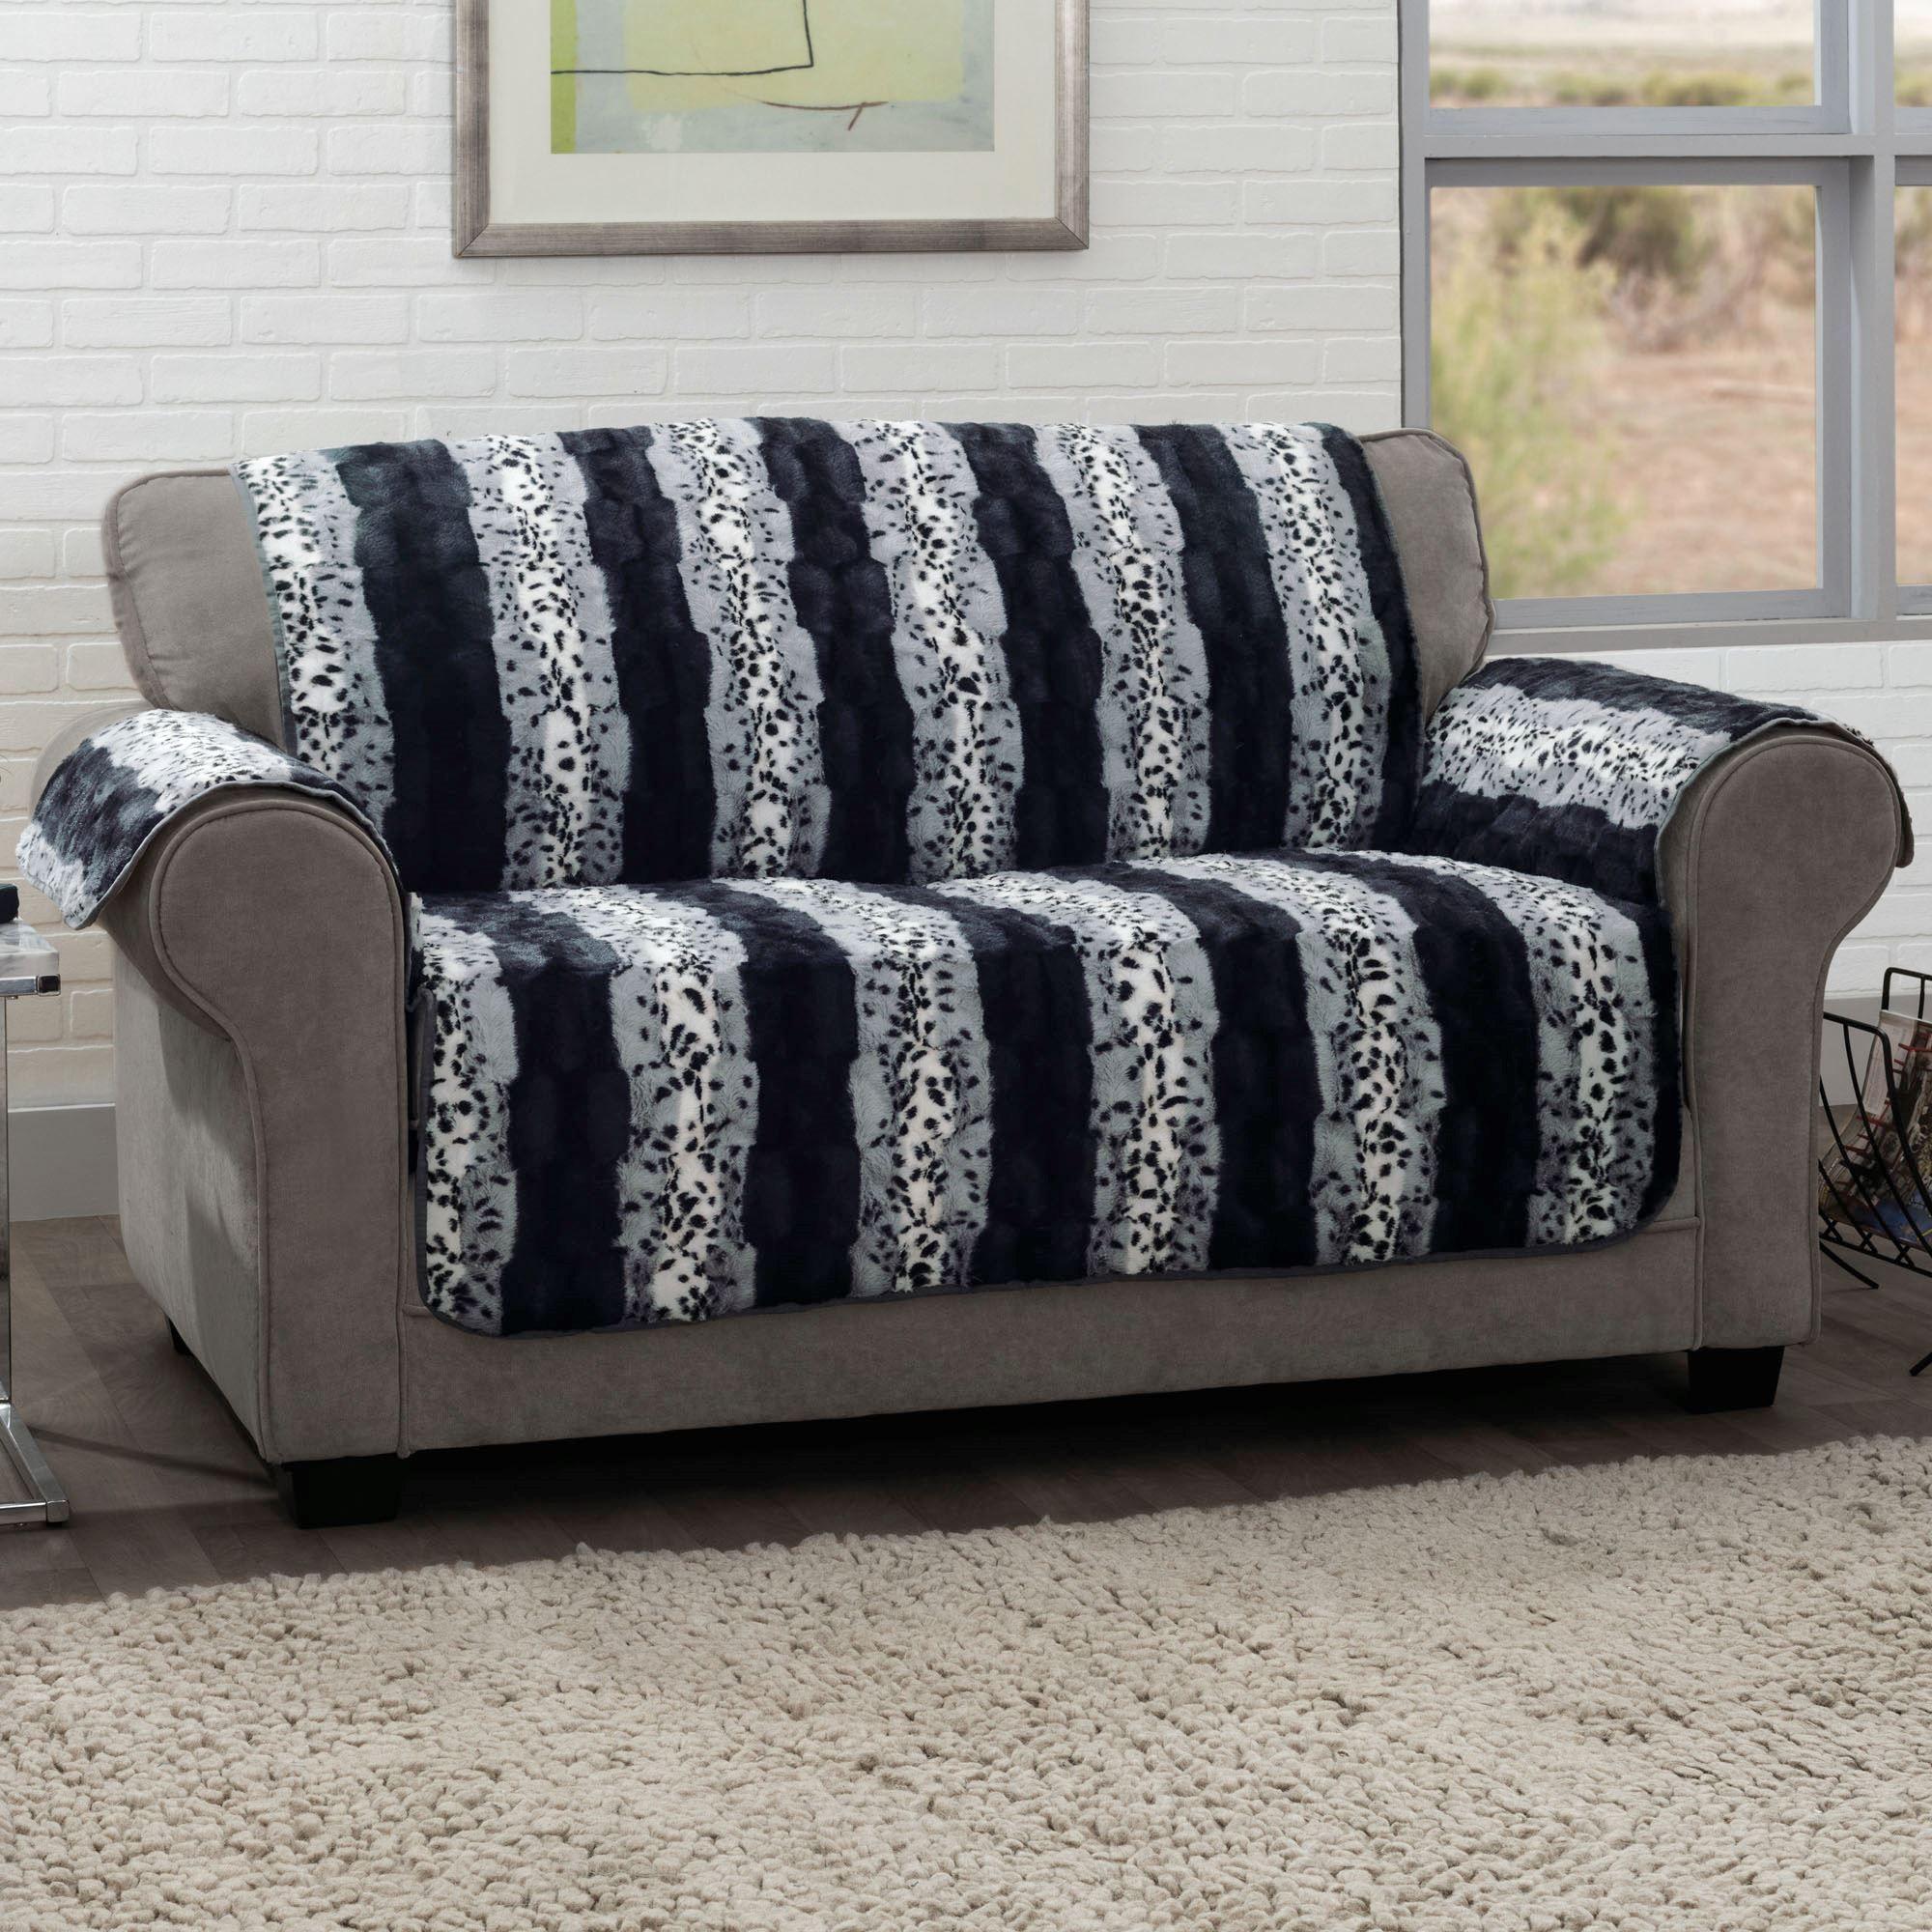 Prowl Furniture Protector Black Loveseat